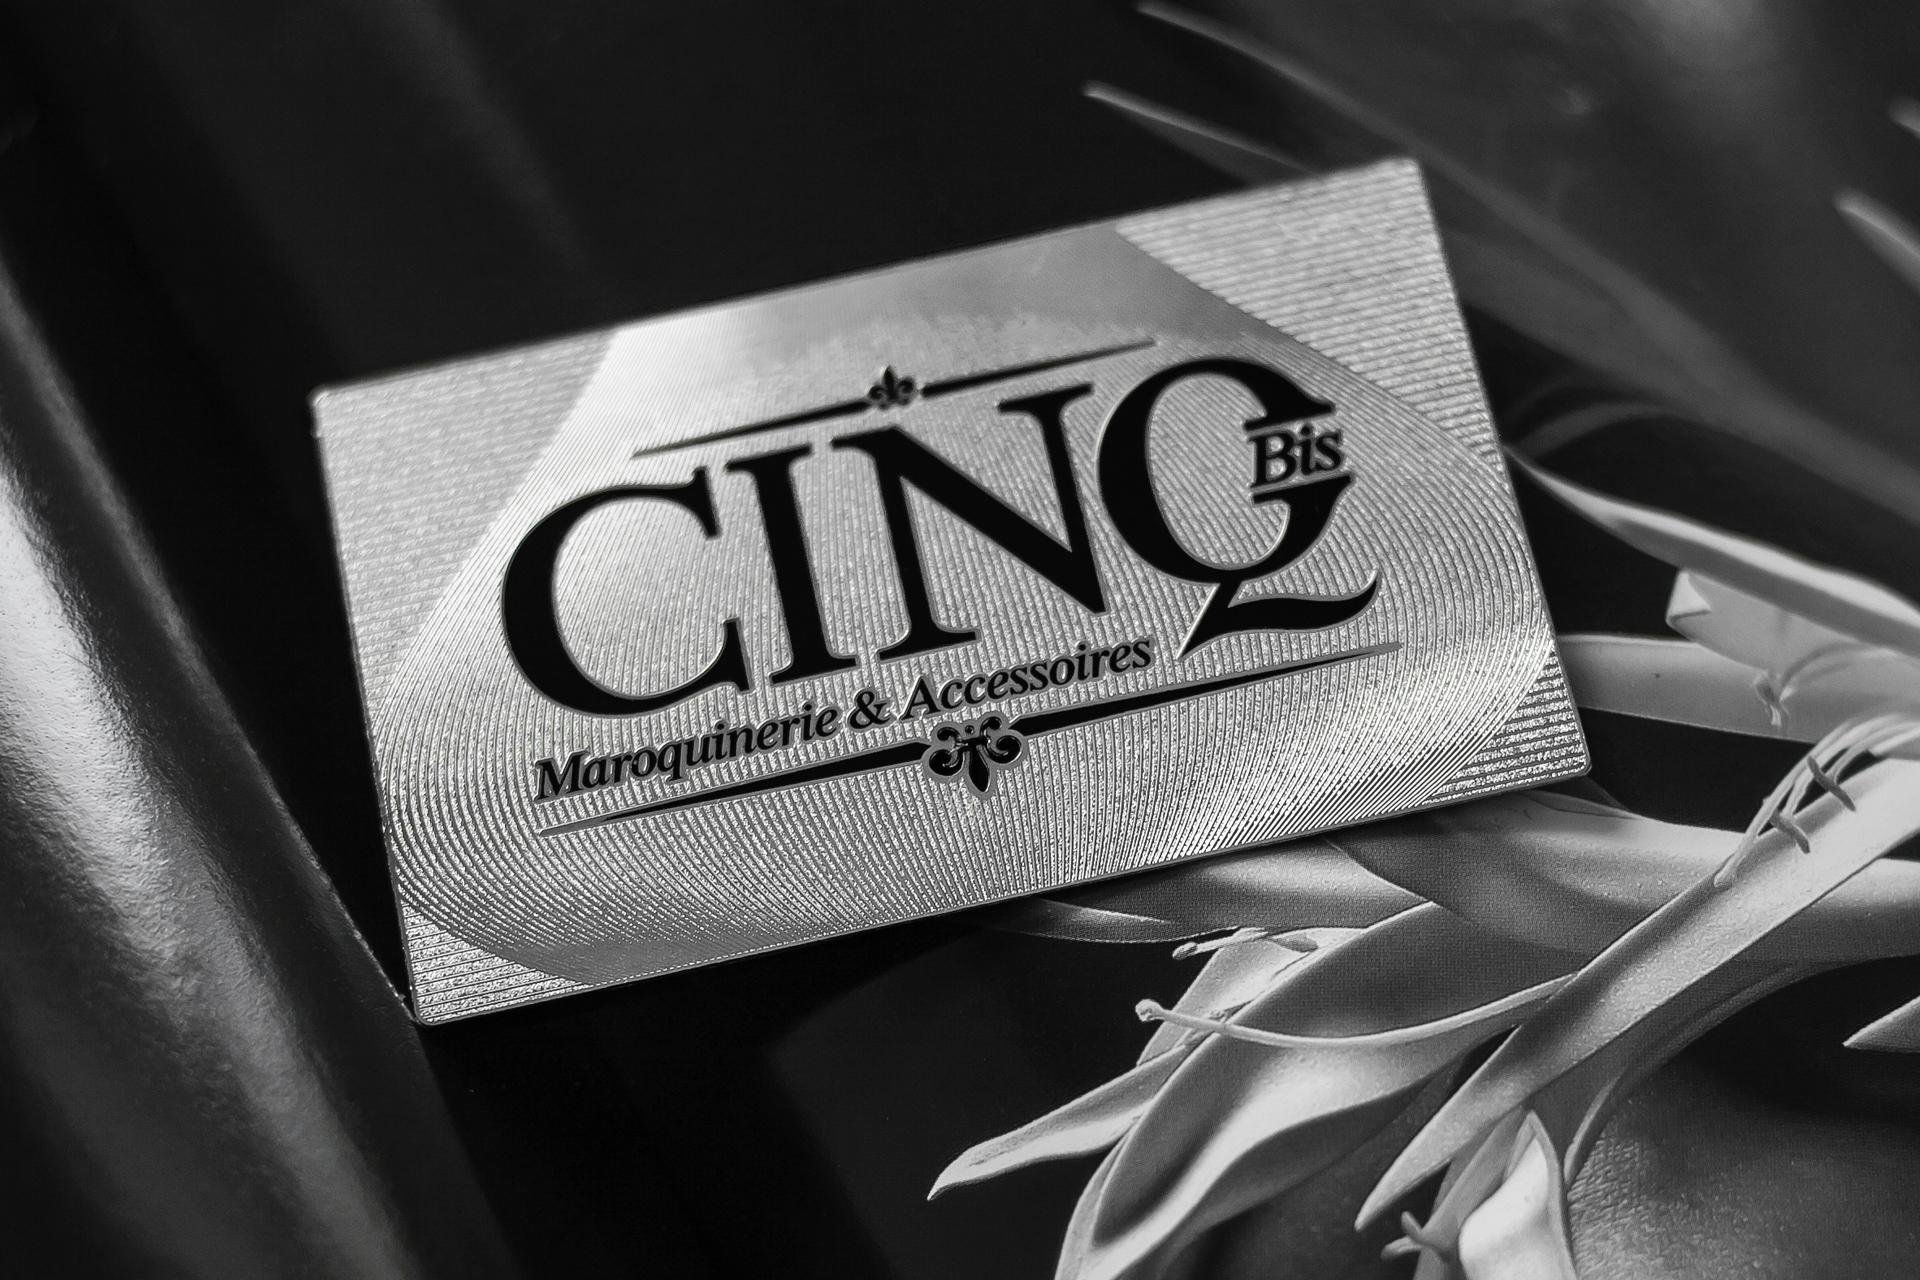 Metal business cards stainless steel member VIP